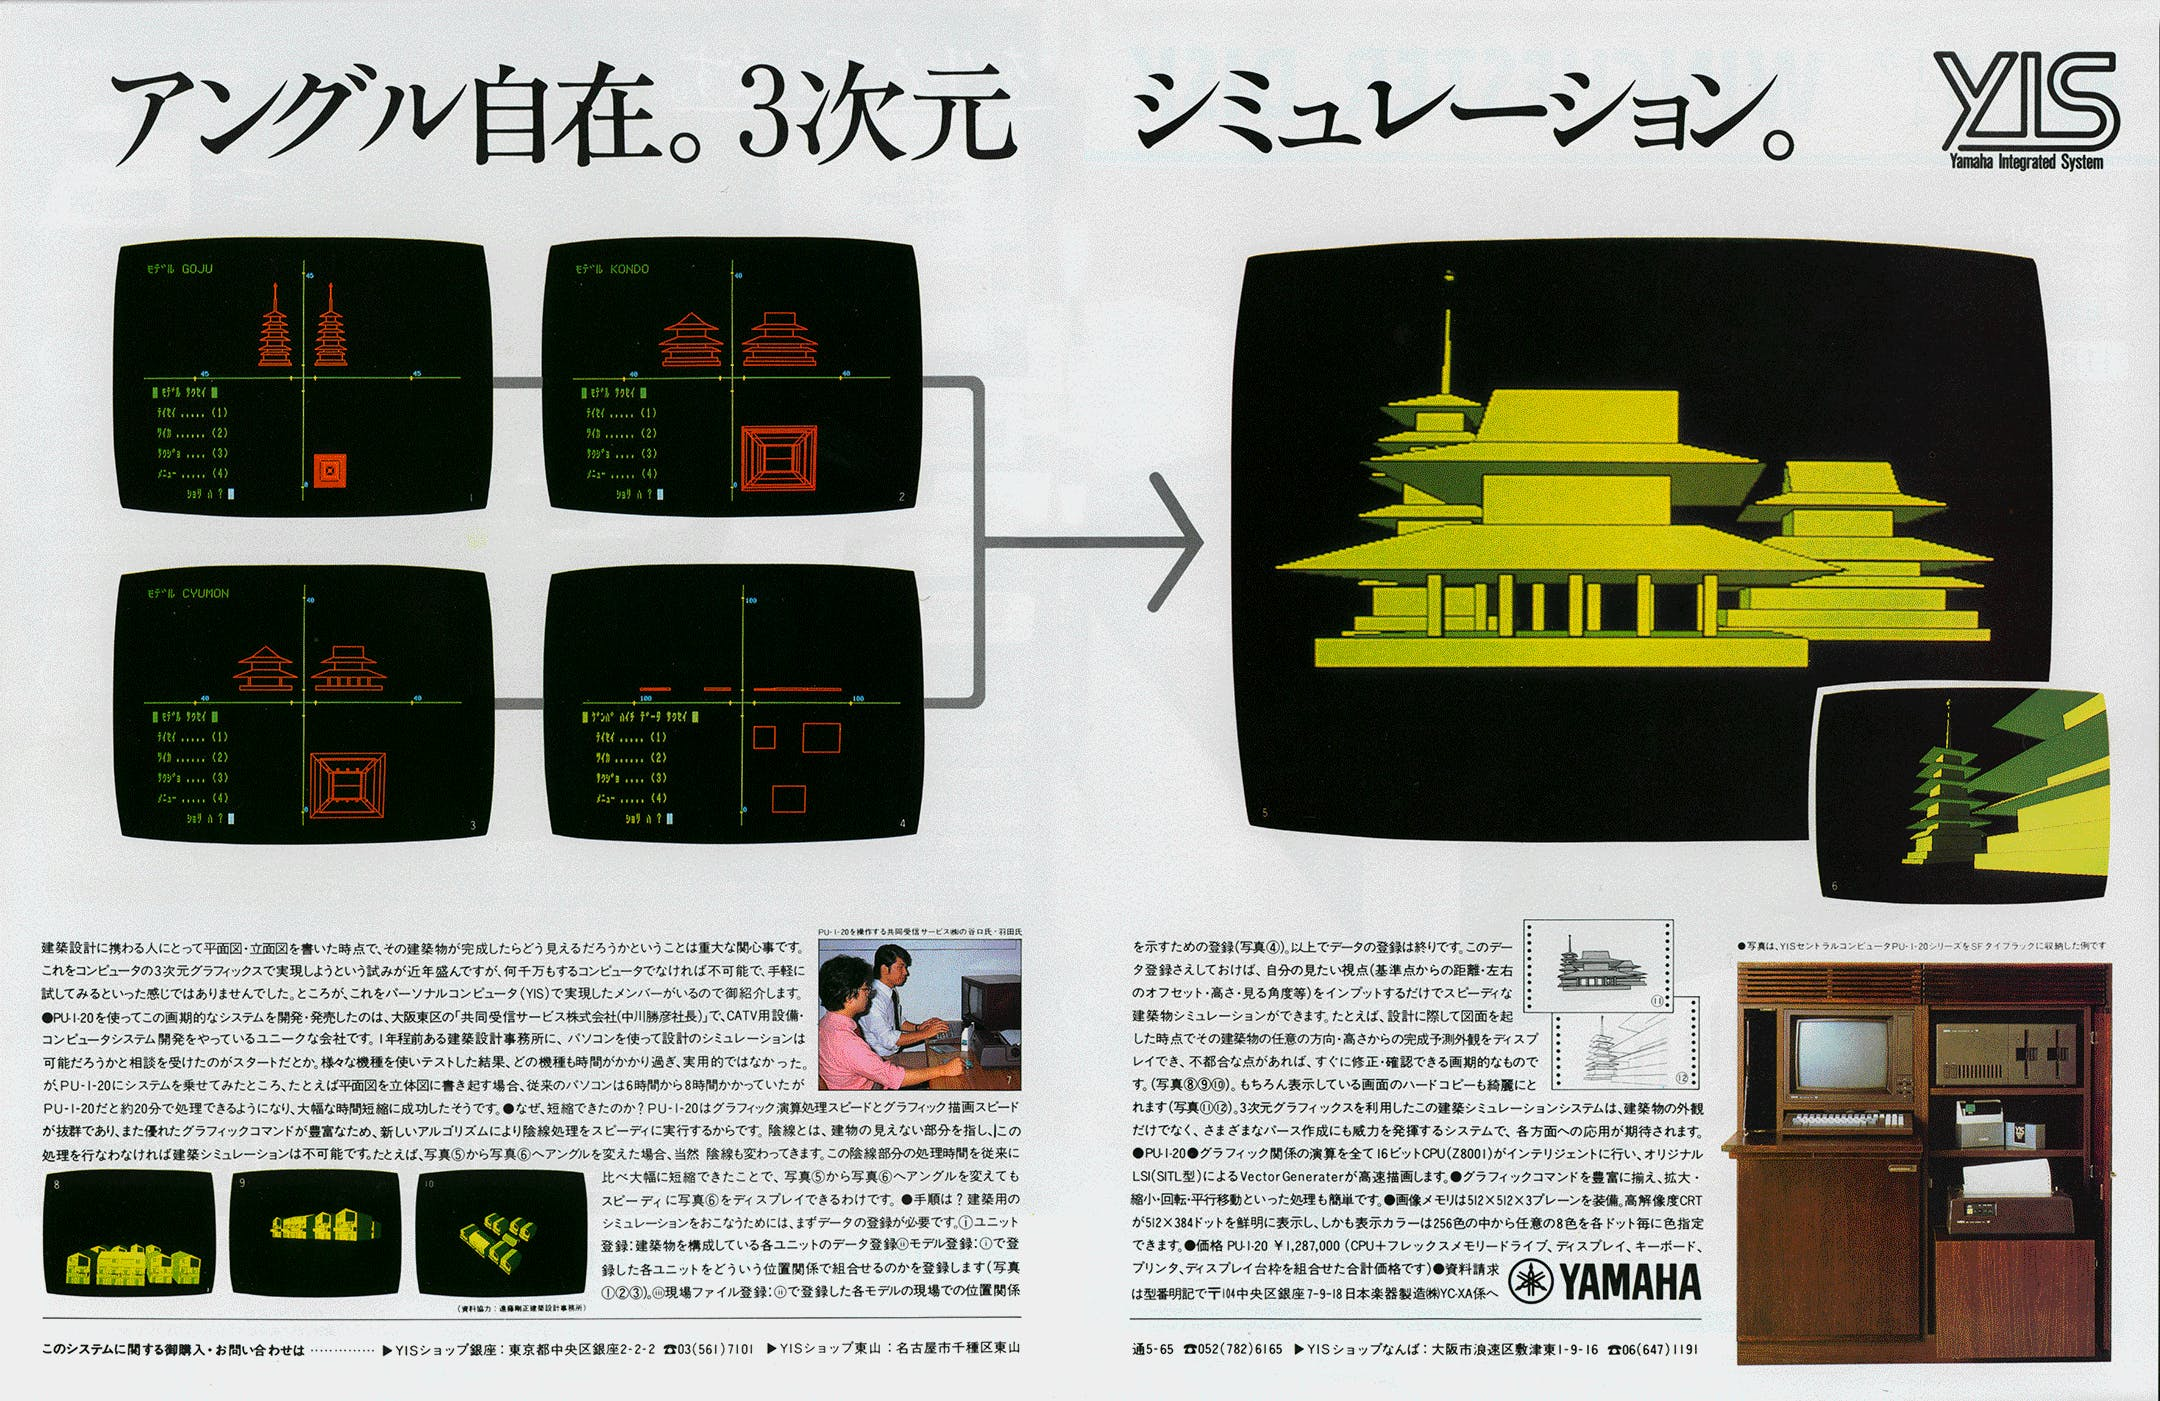 Yamaha YIS advertisement ASCII japan 12 1982